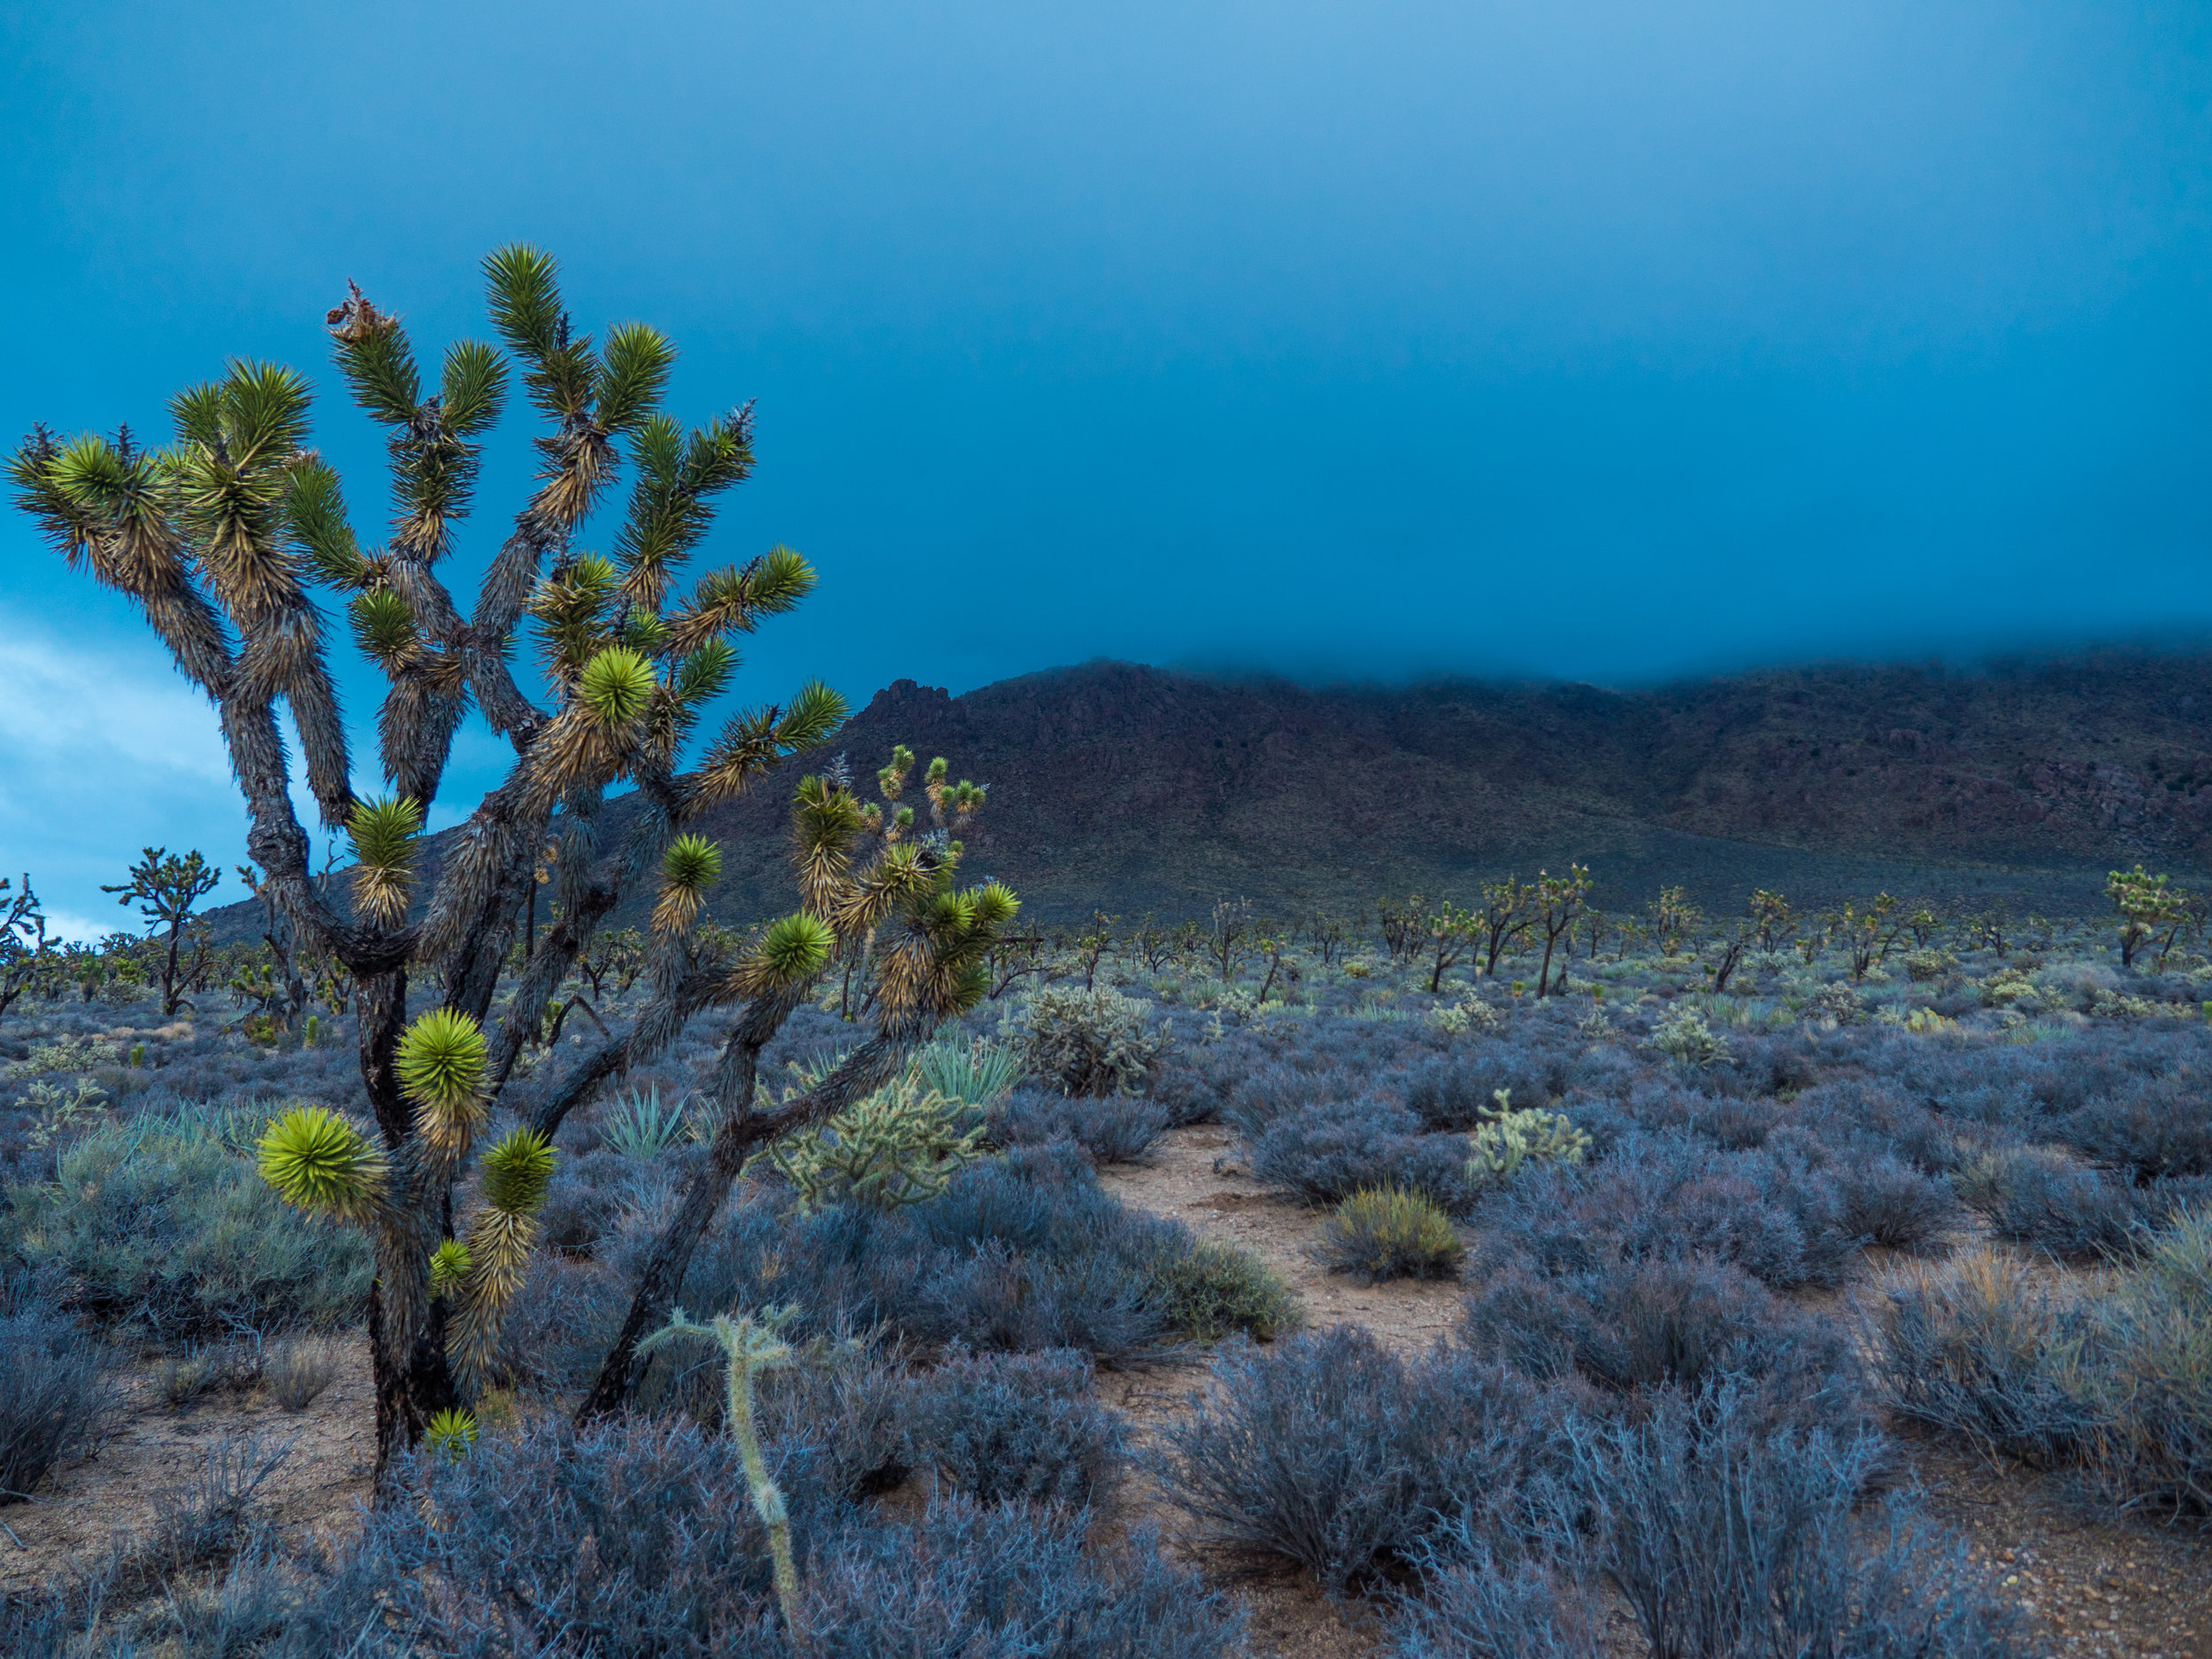 Joshua Trees in Mojave